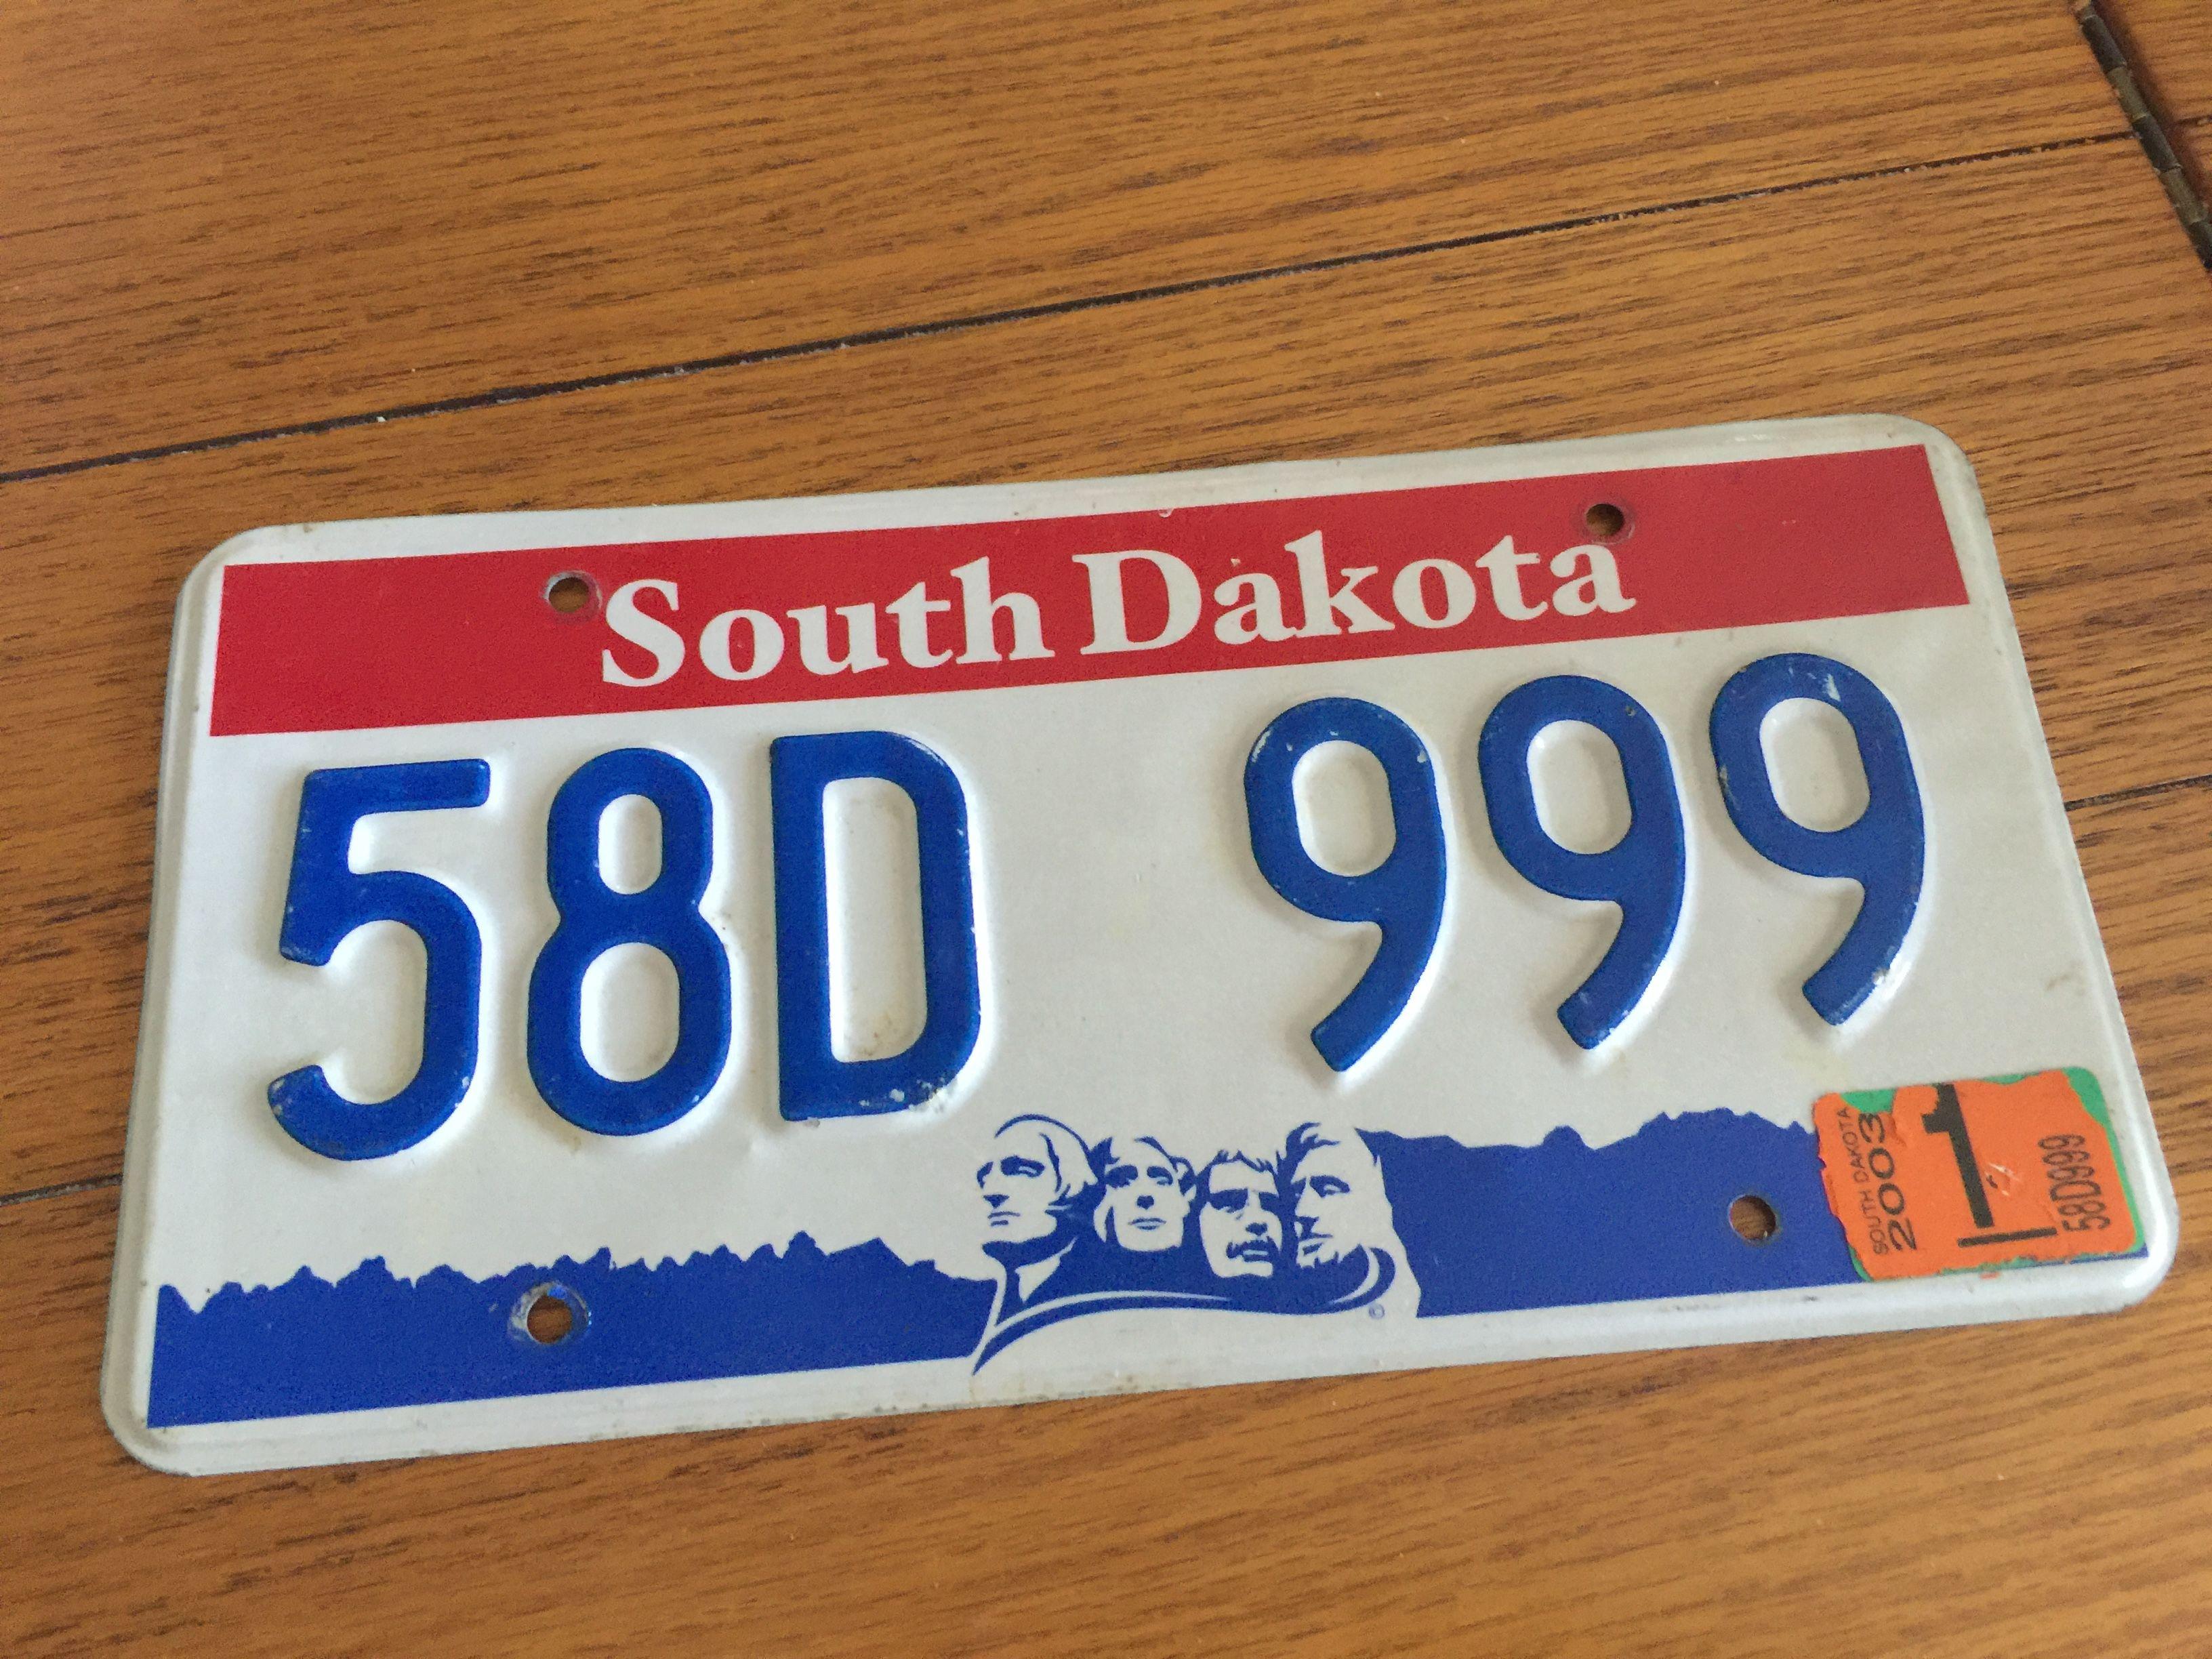 South Dakota Red White Blue Stanley County South Dakota Dakota License Plate